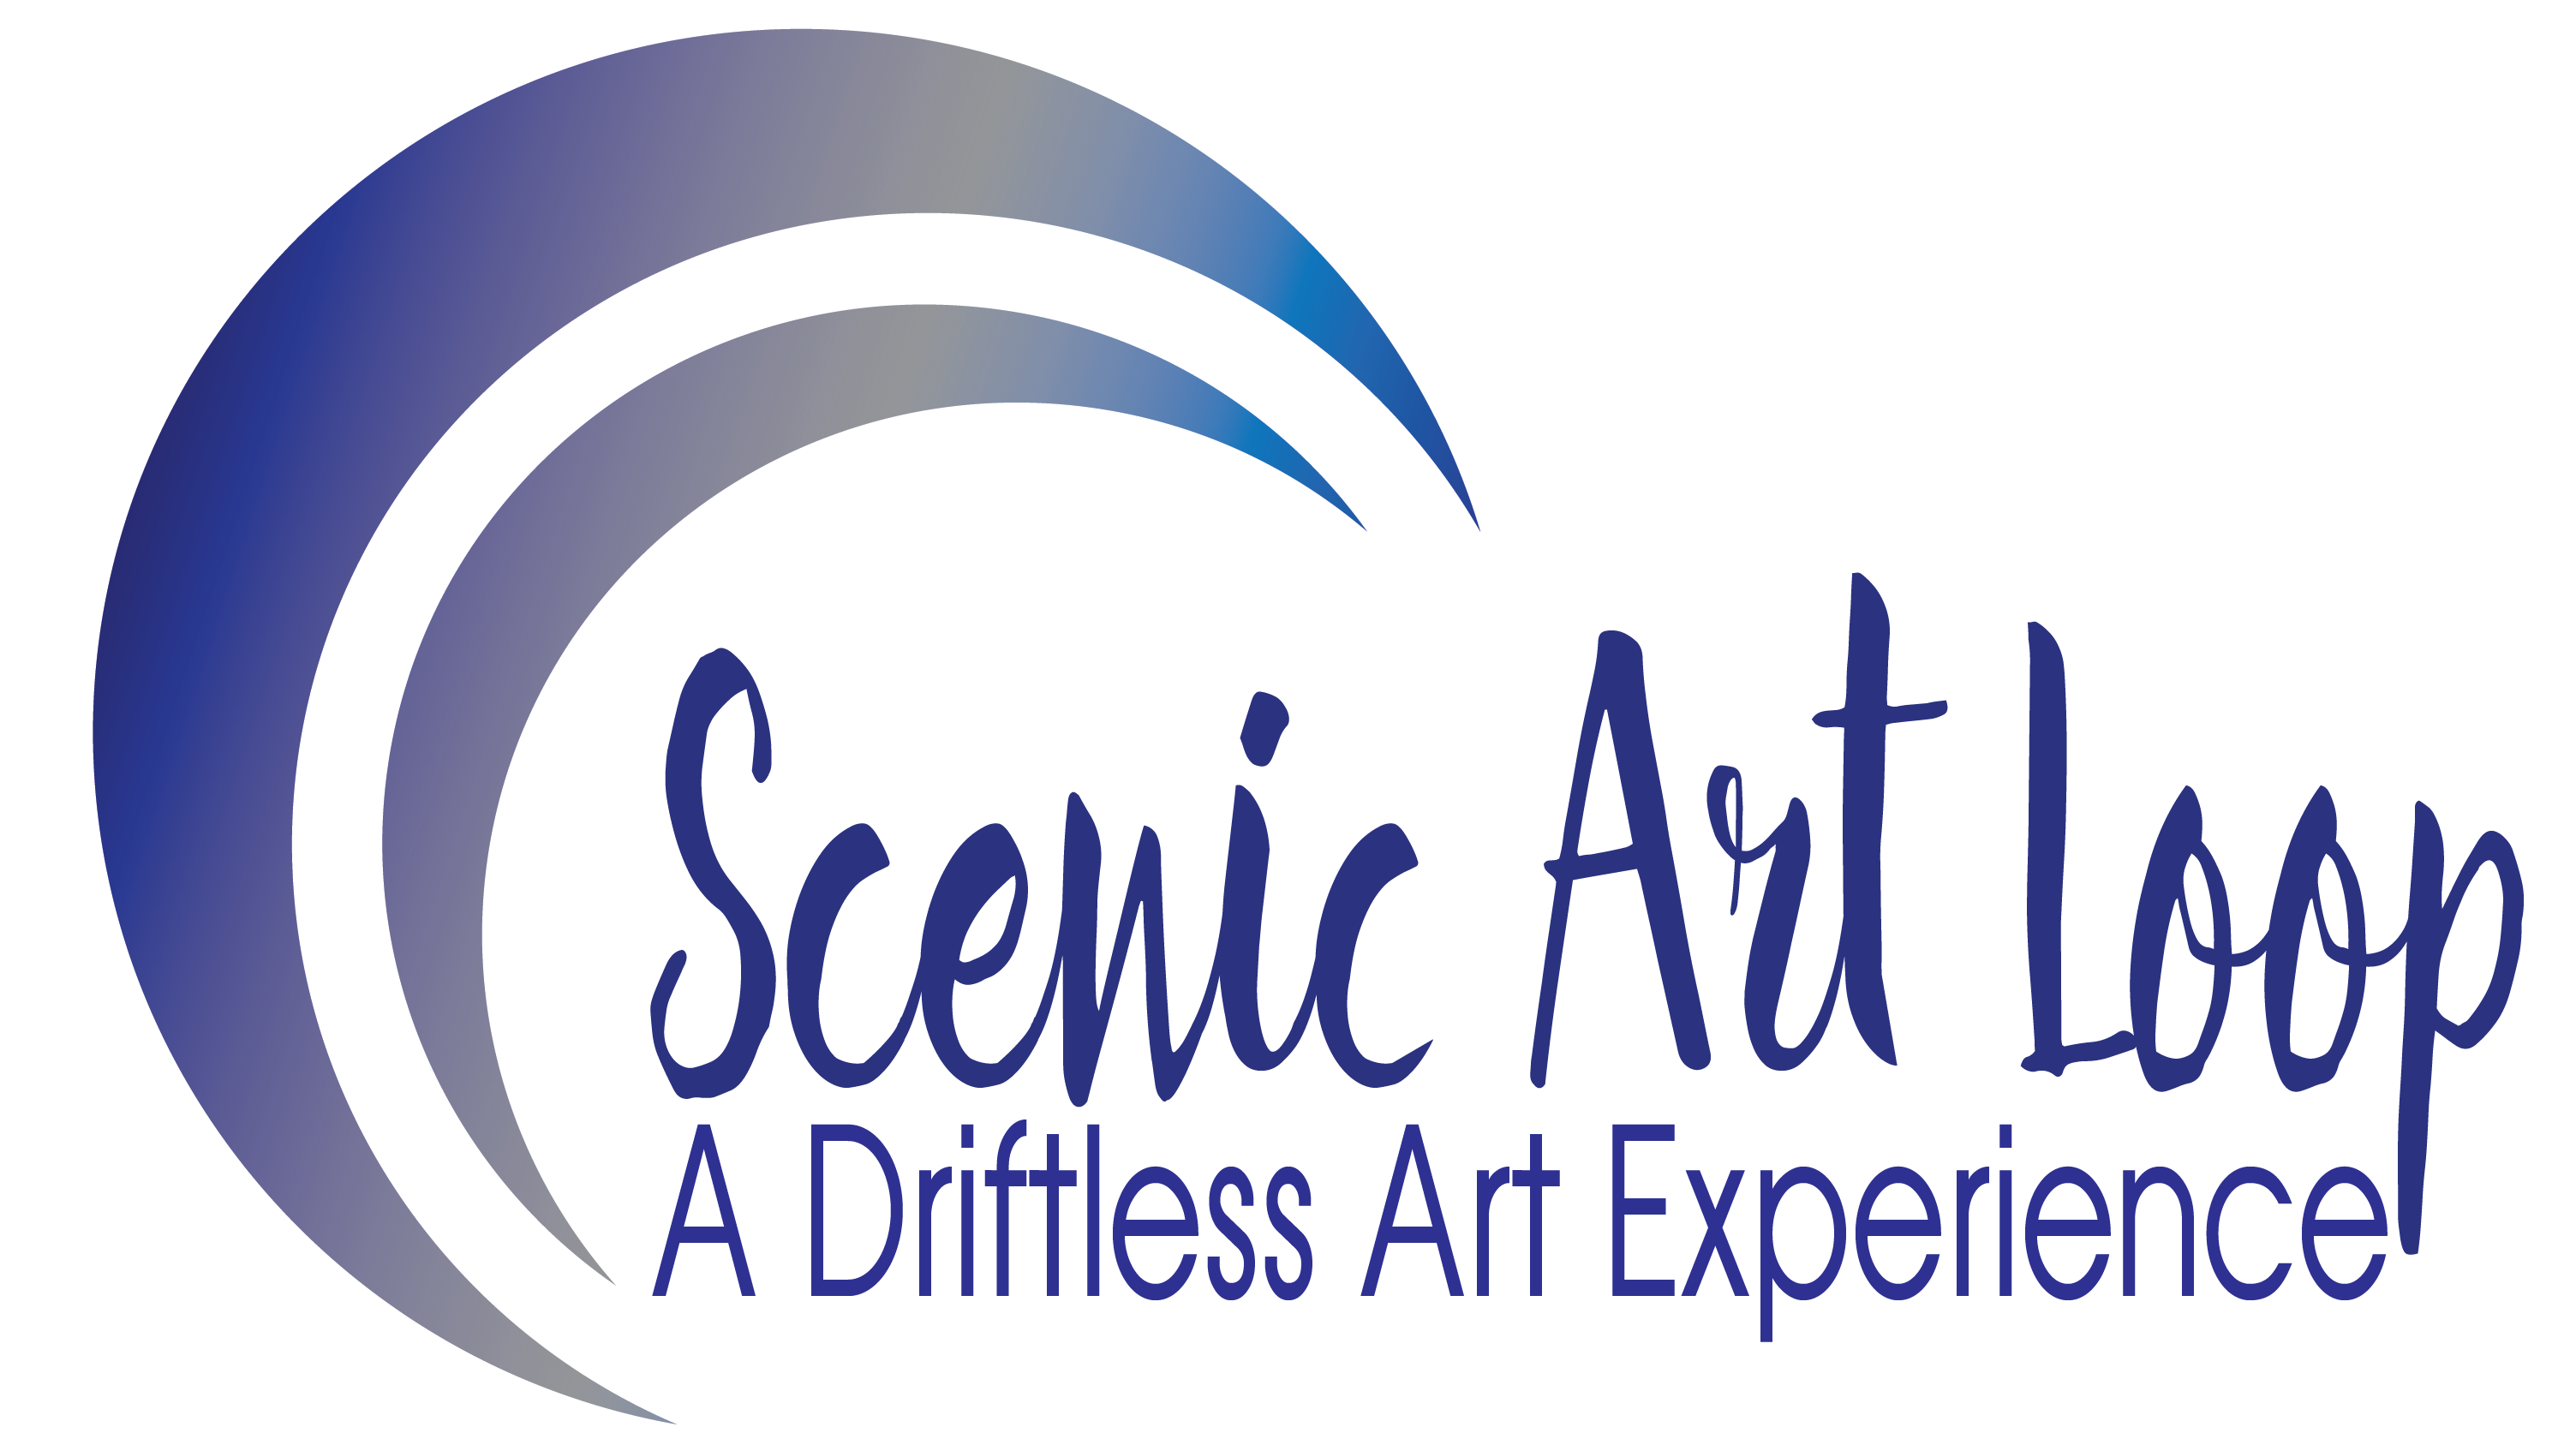 Scenic Art Loop by ARRT